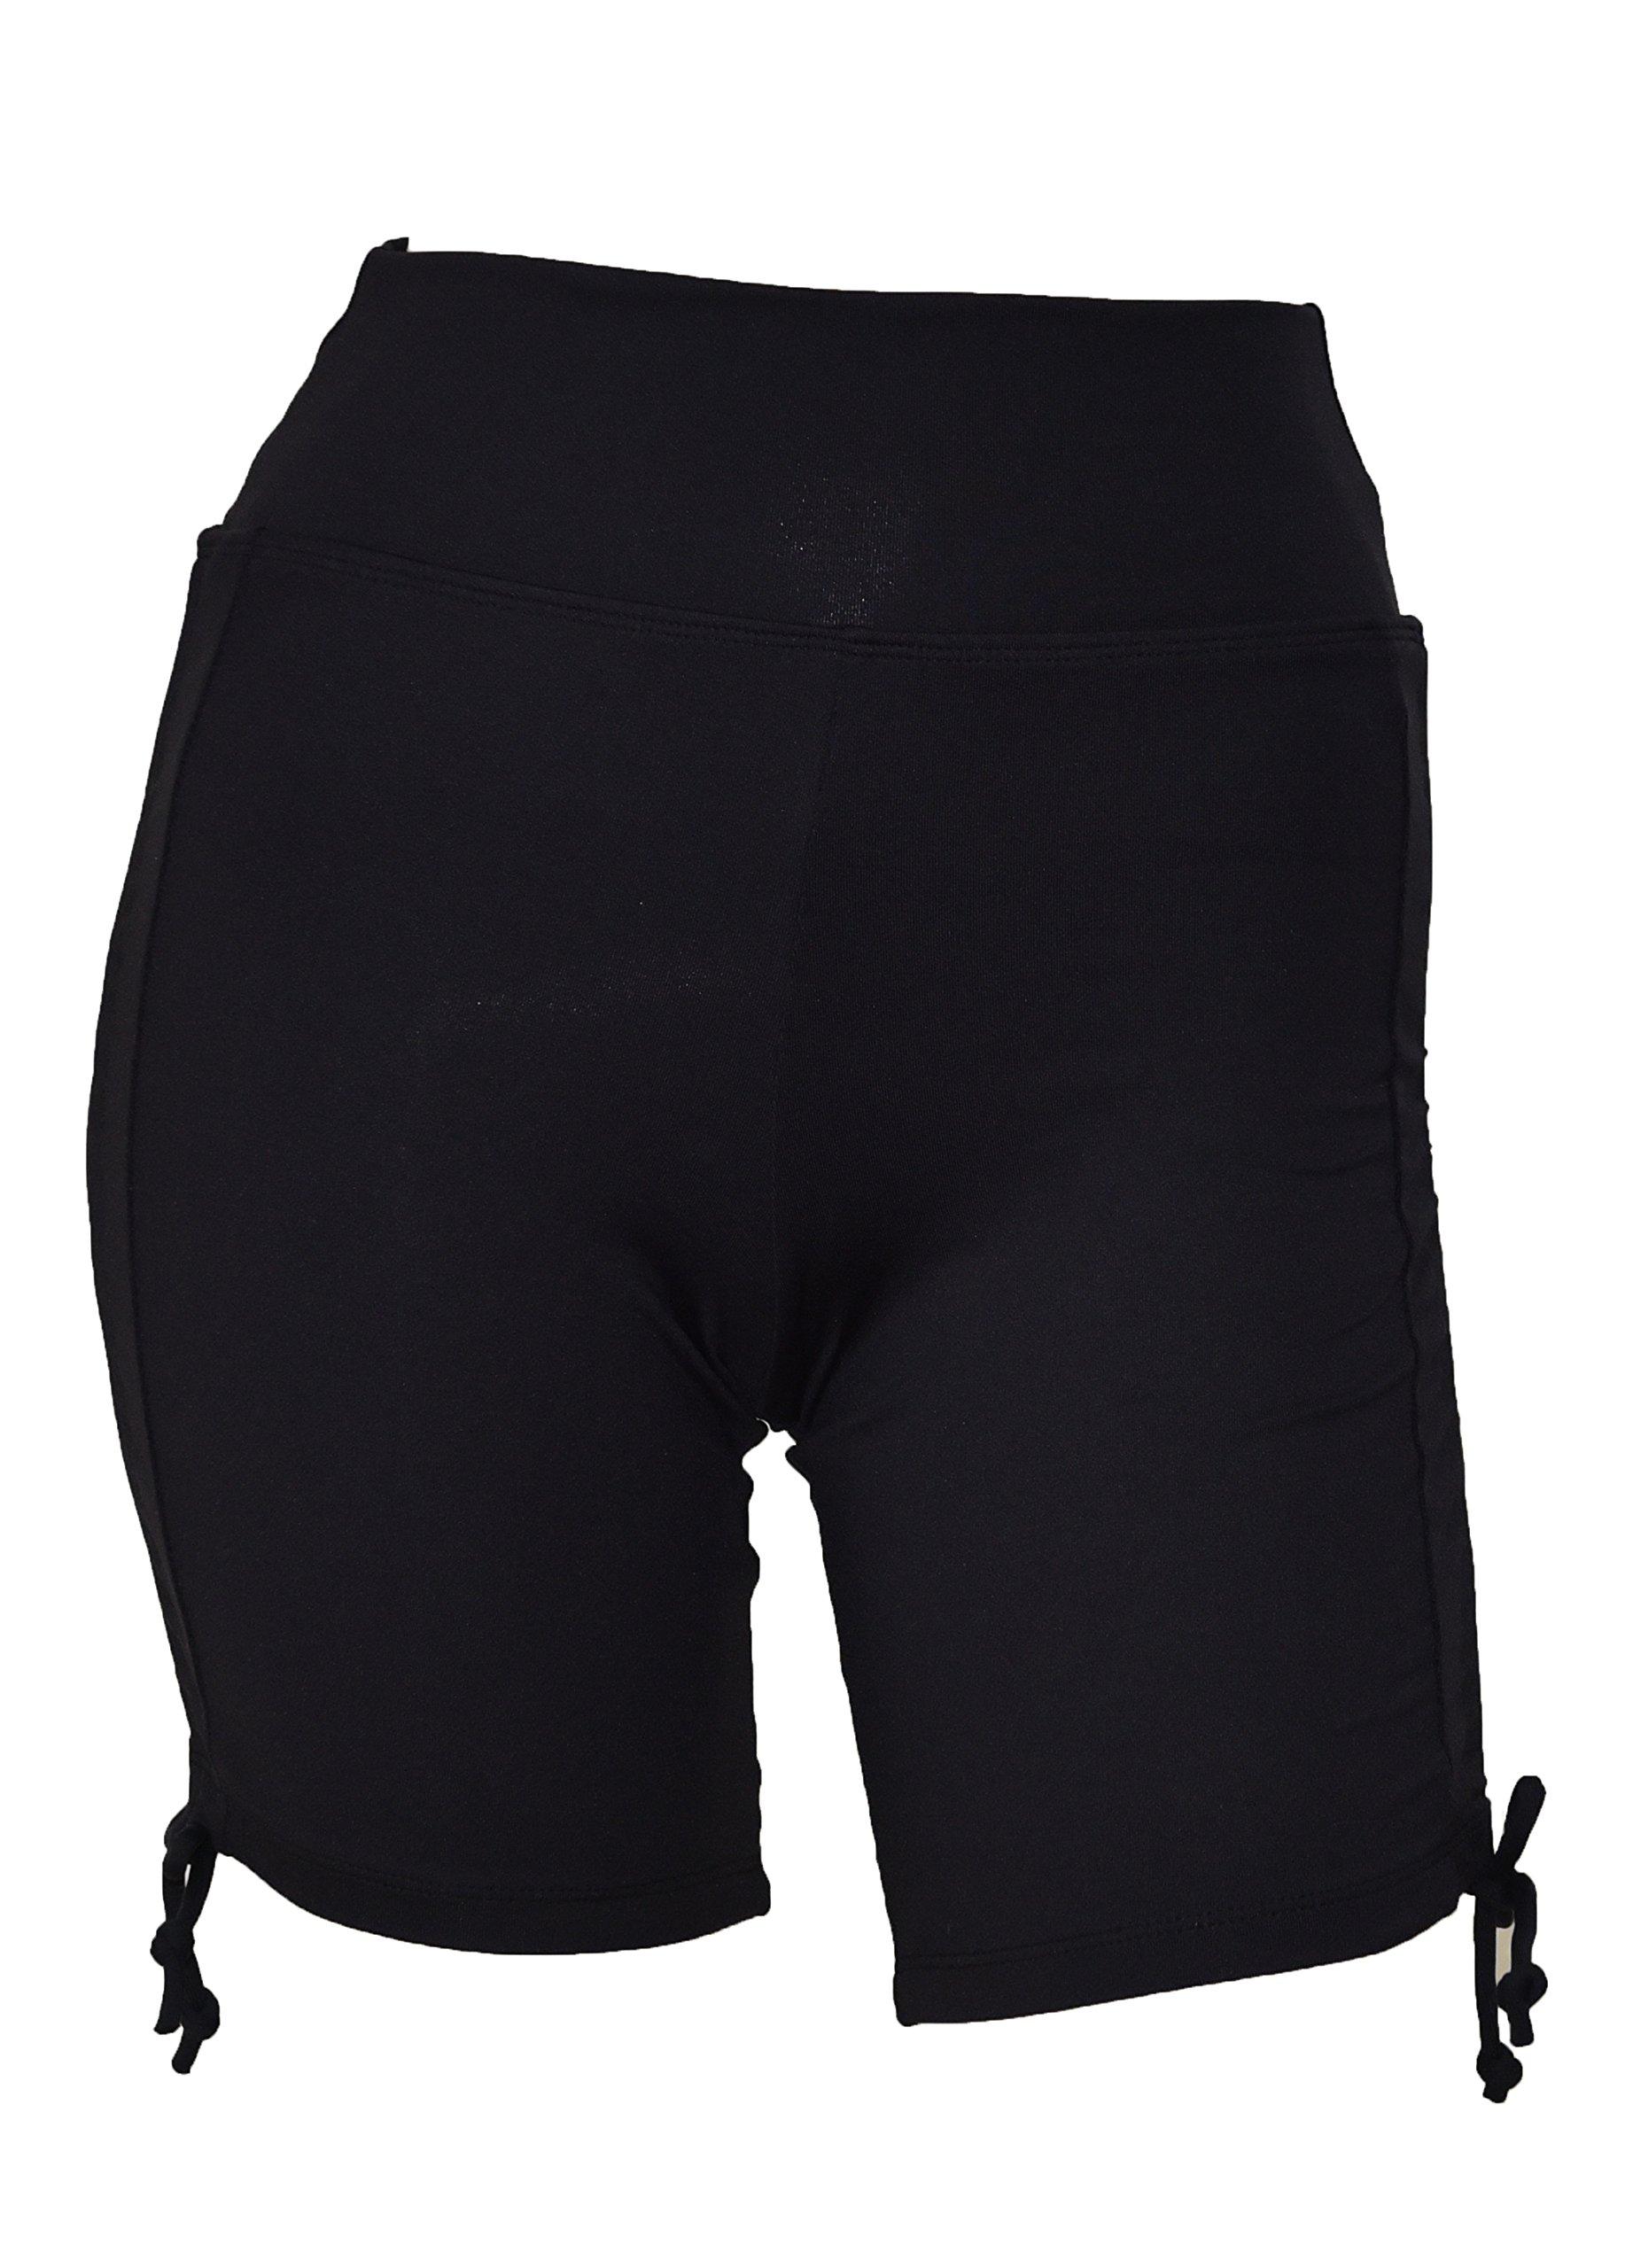 Private Island Women UV Swim Rash Guard Board Shorts Pants Yoga (XXXL, Black) by Private Island